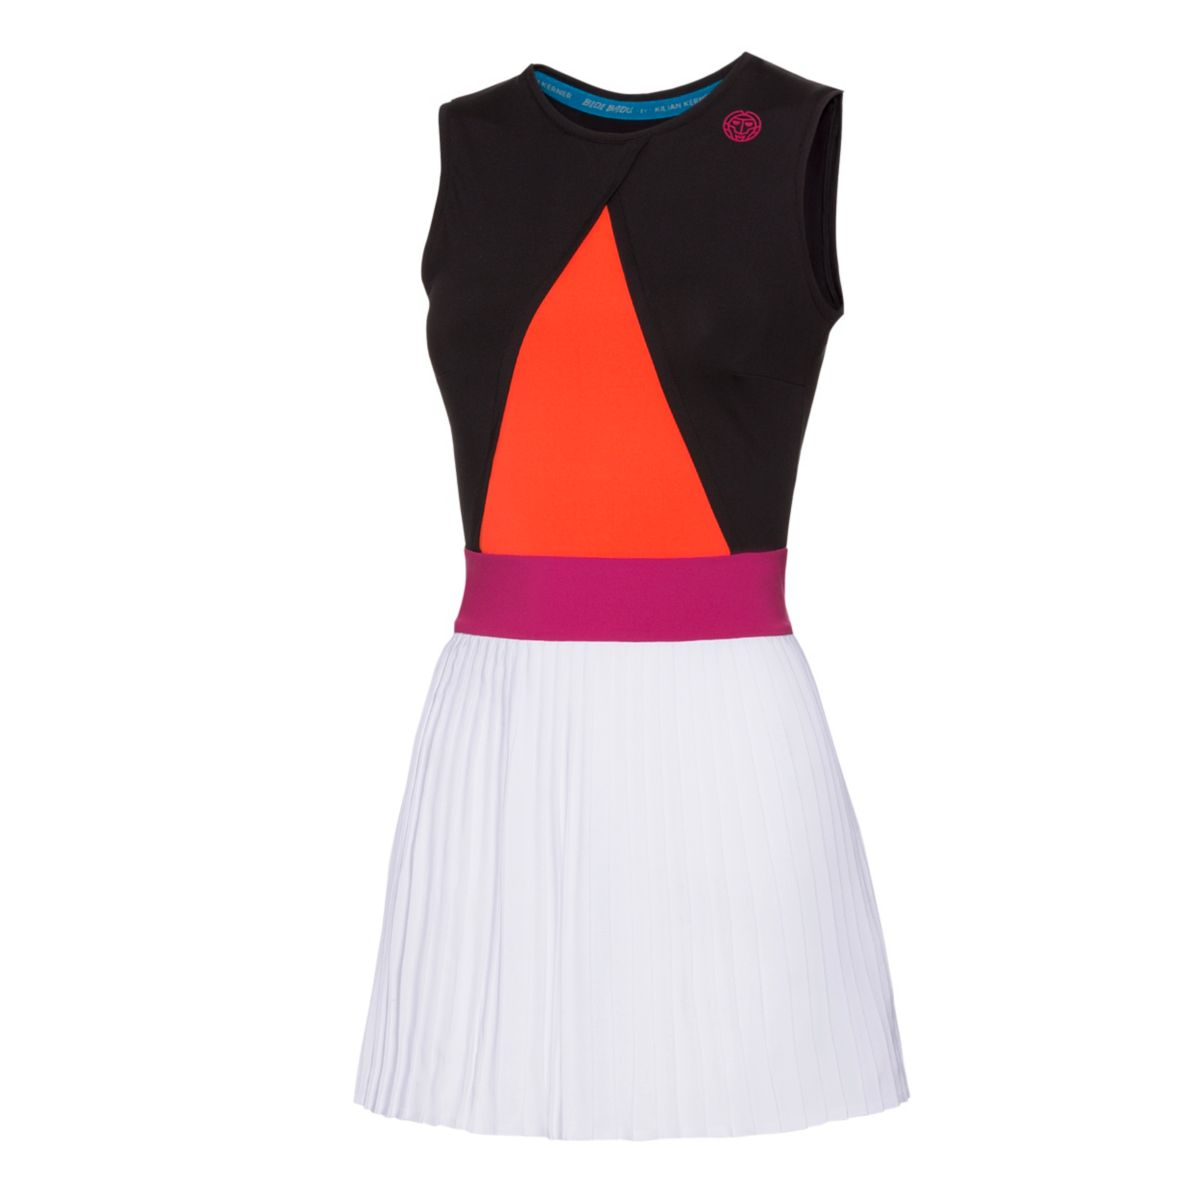 778375b7e89c BIDI BADU Tennis-Kleid im innovativen Look